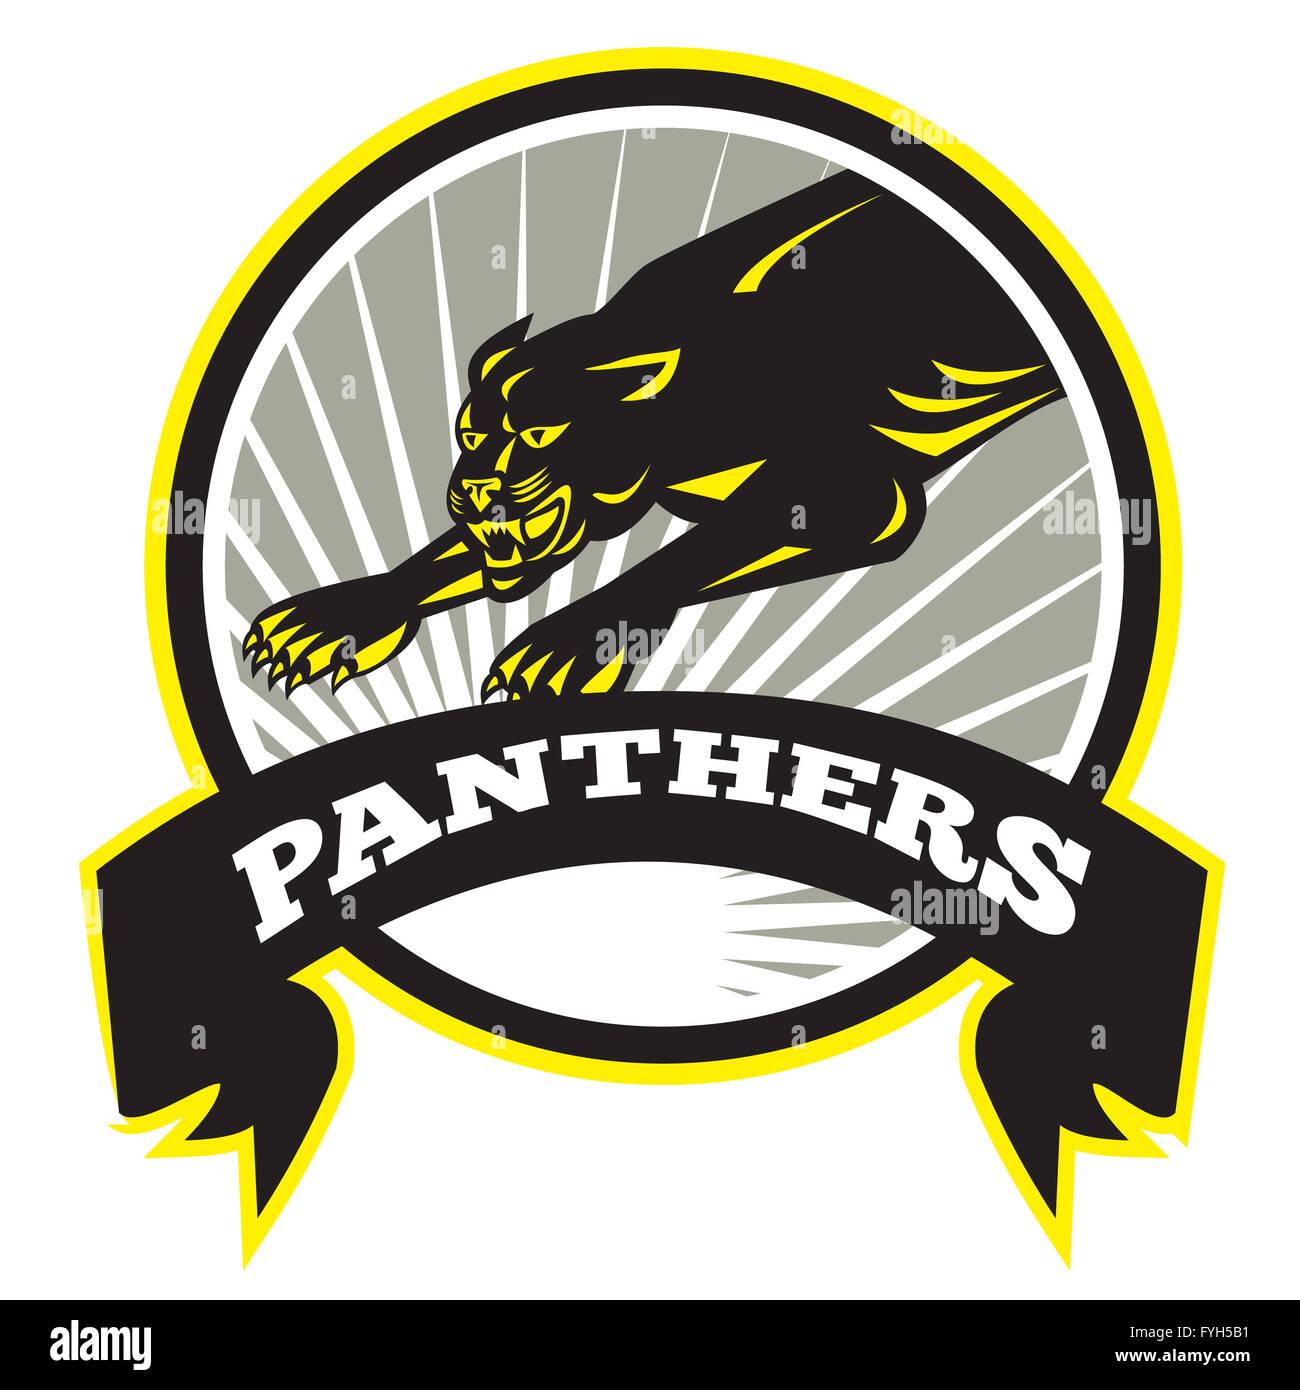 Black Jaguar Growl: Panther Big Cat Growling Stock Photo, Royalty Free Image